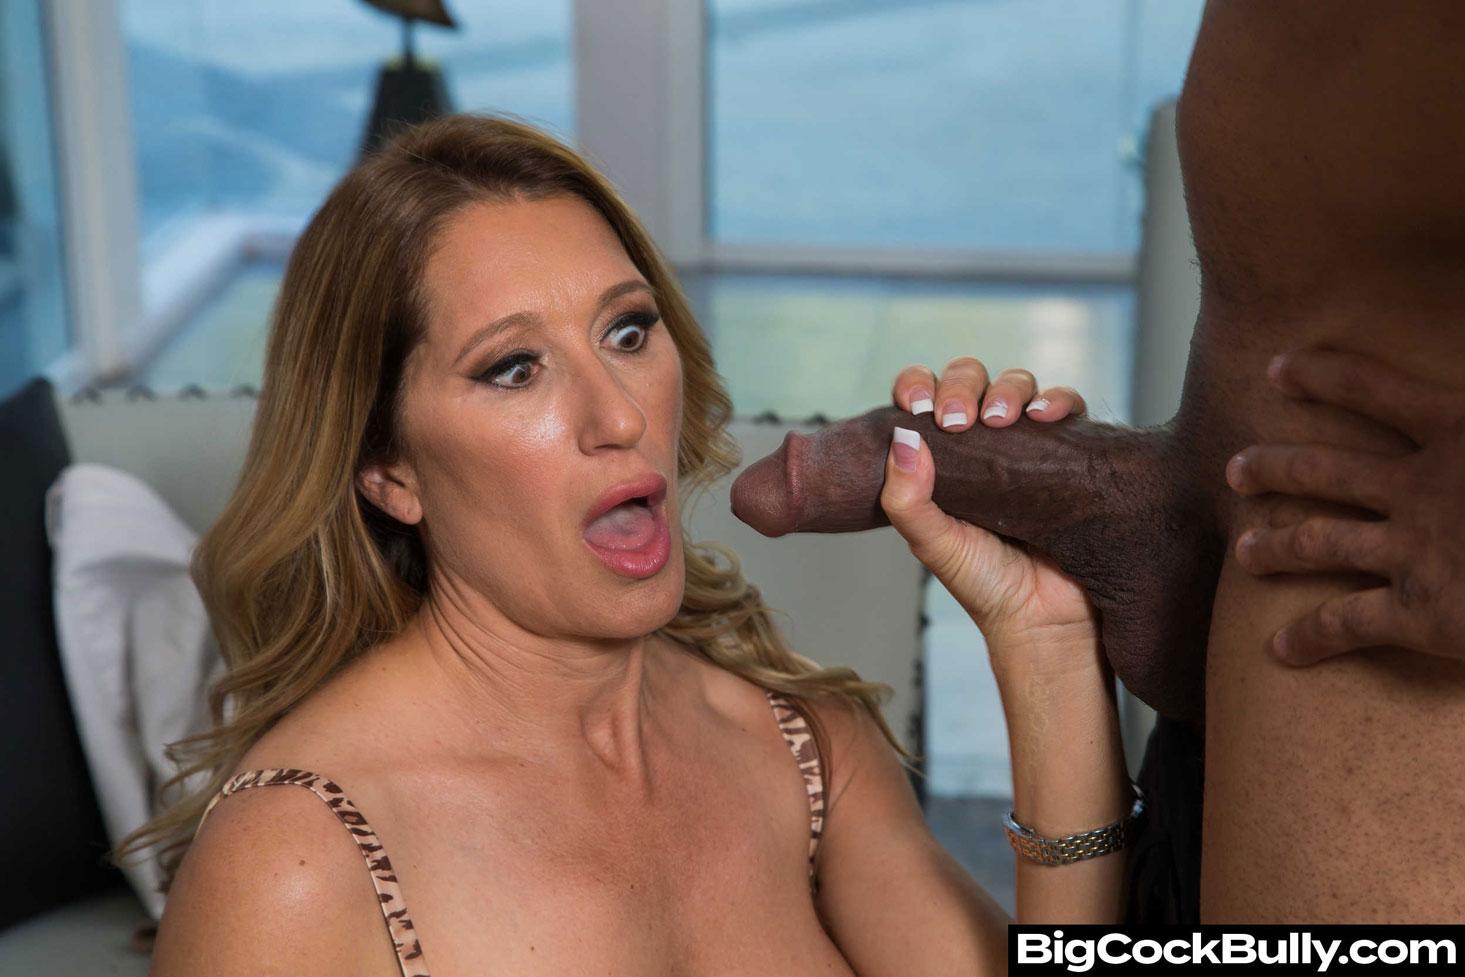 Girlsway - Sloan Rider Takes a Big Black Cock 2